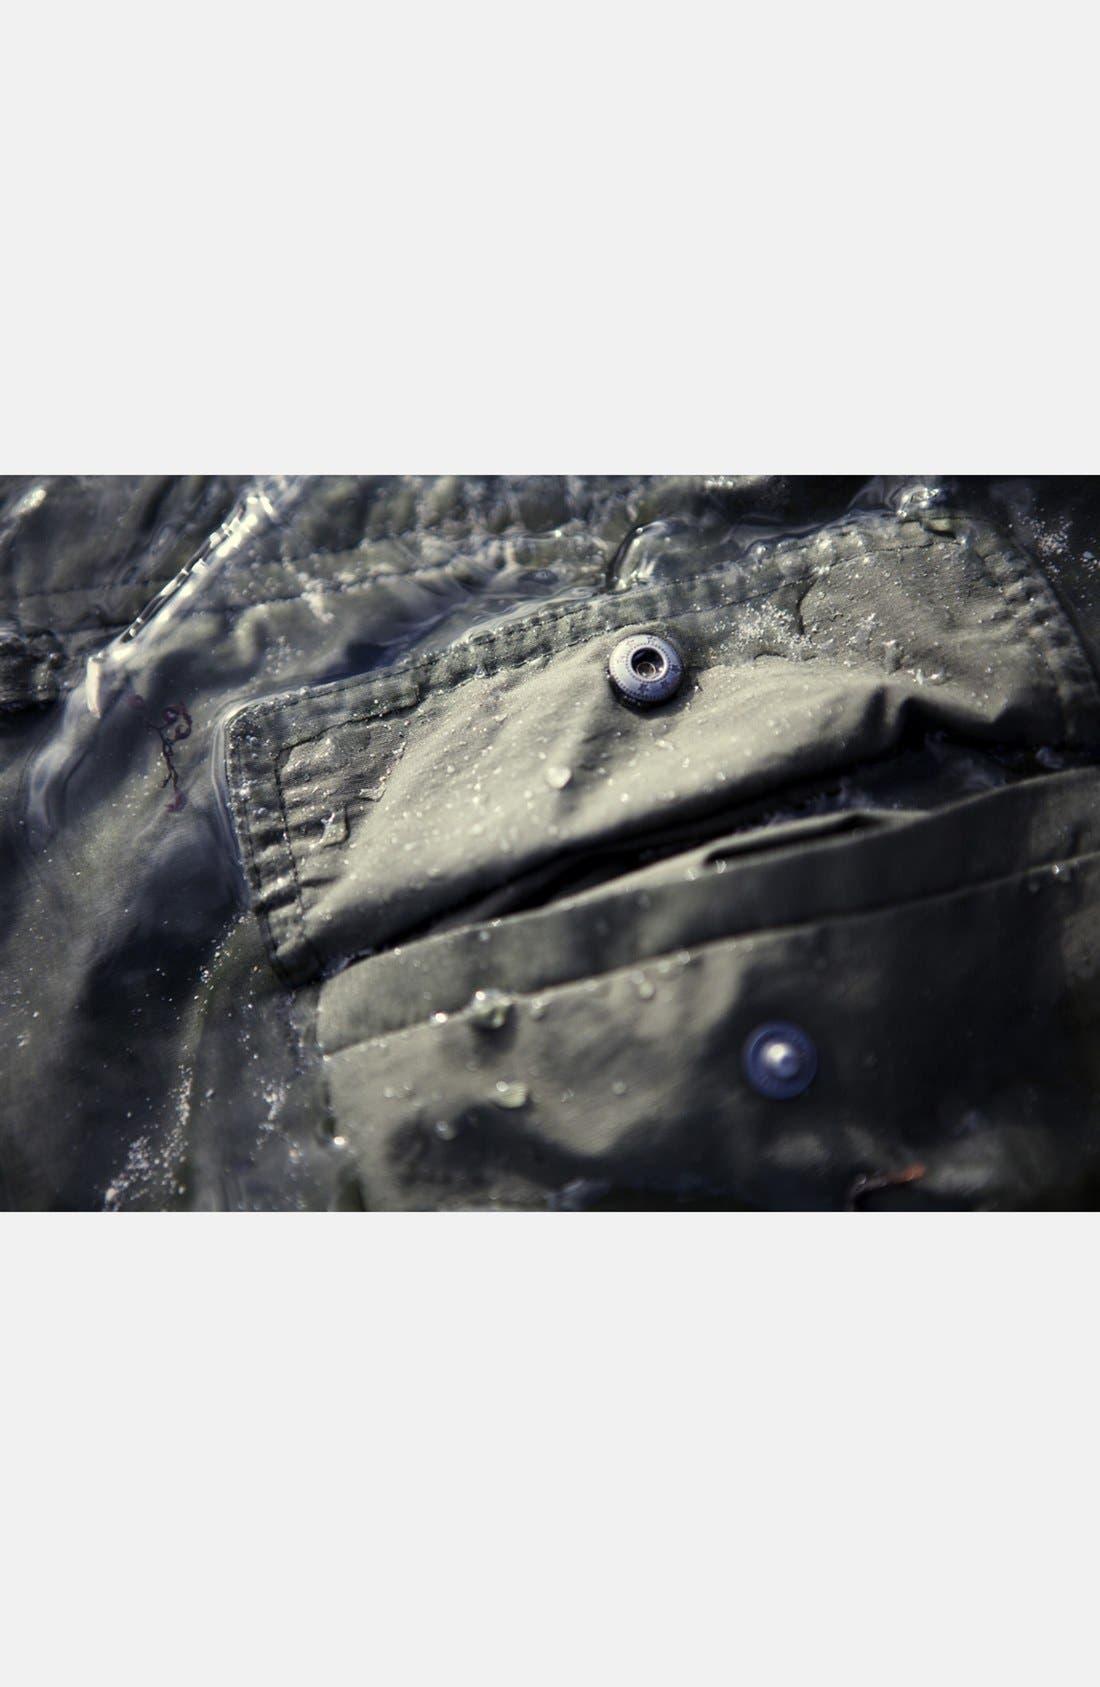 "'Calder 7.5""' Board Shorts,                             Alternate thumbnail 2, color,                             450"